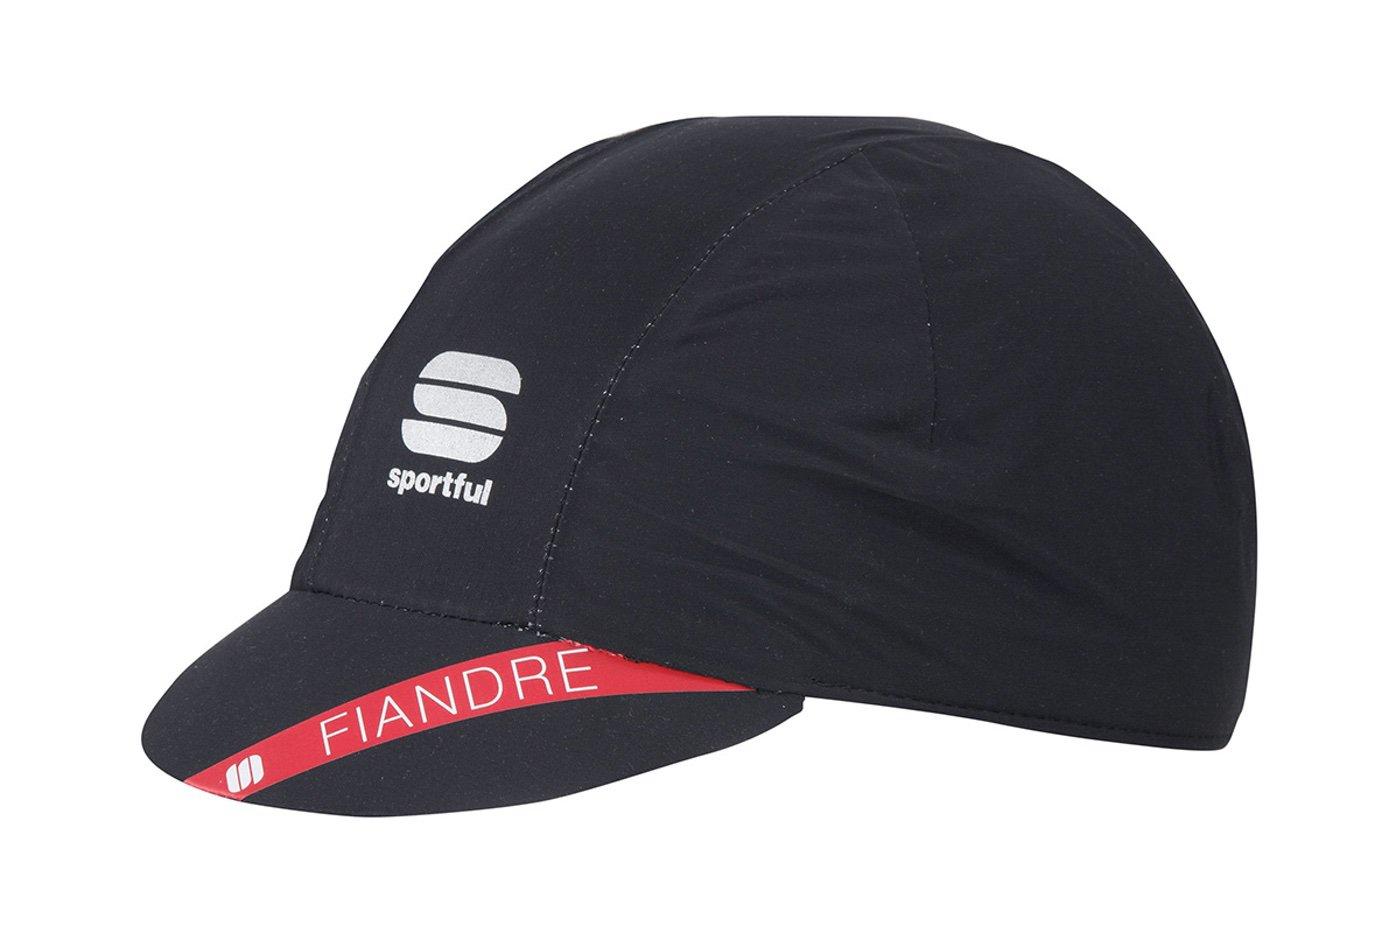 Gorra Sportful Fiandre